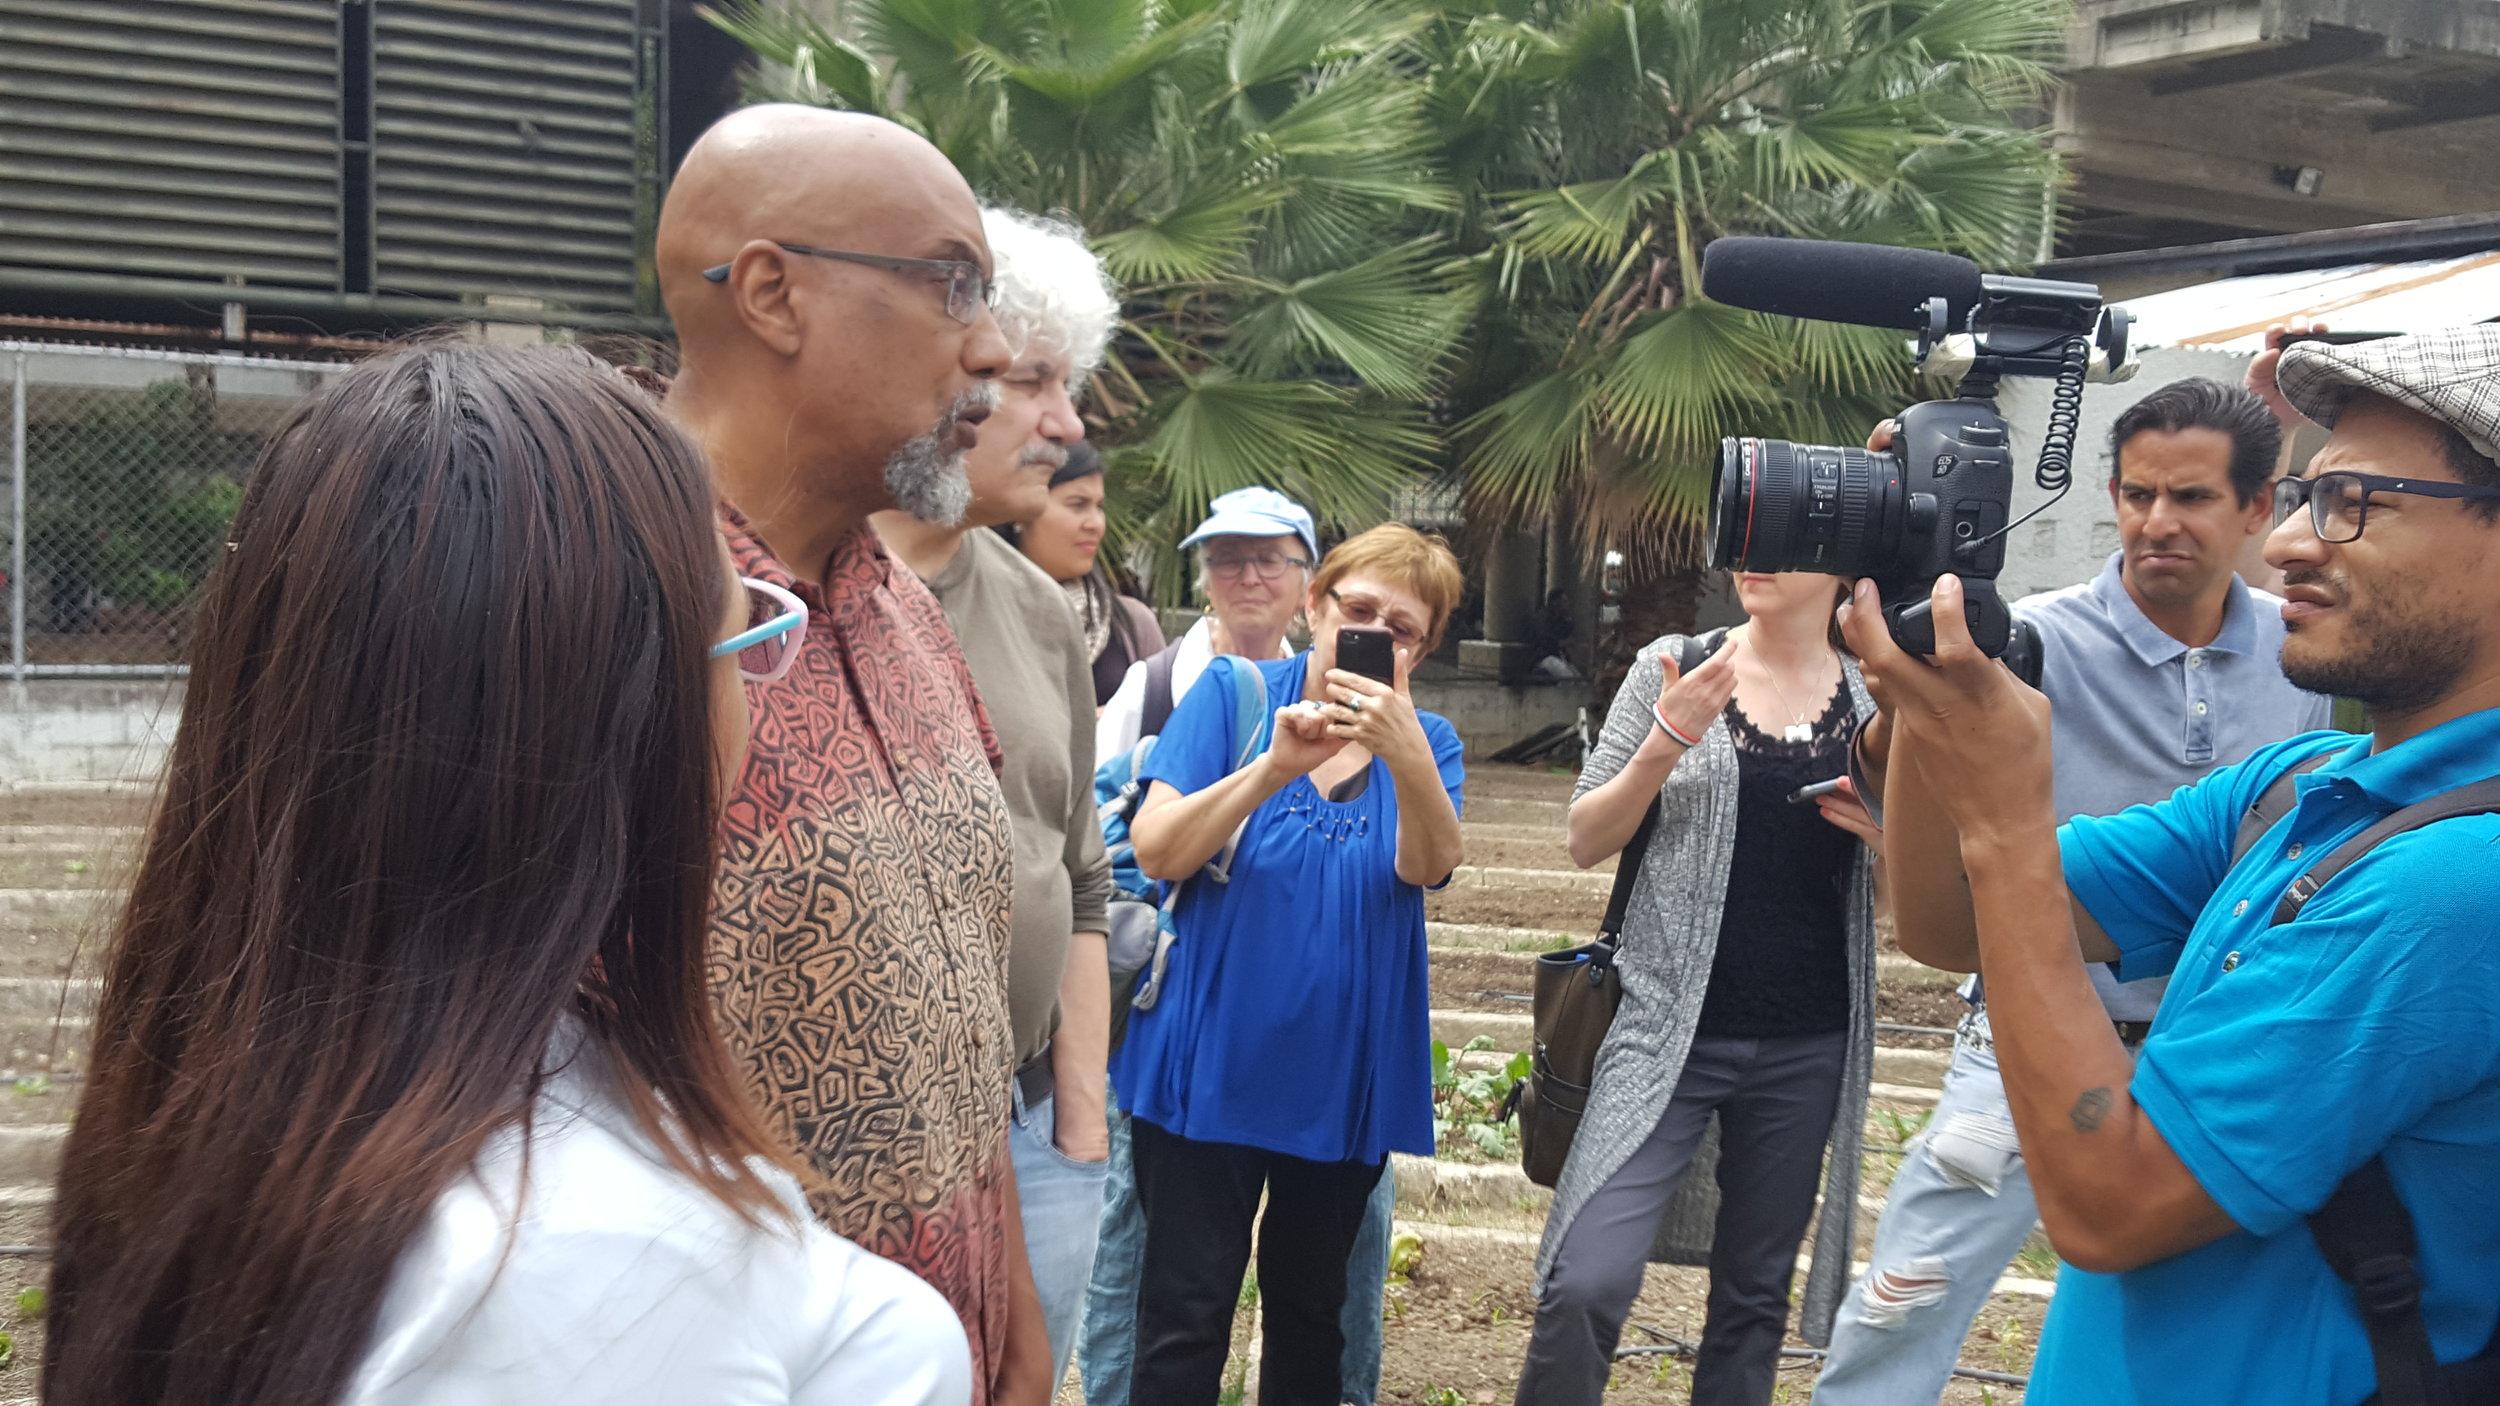 Delegation at Caracas community garden